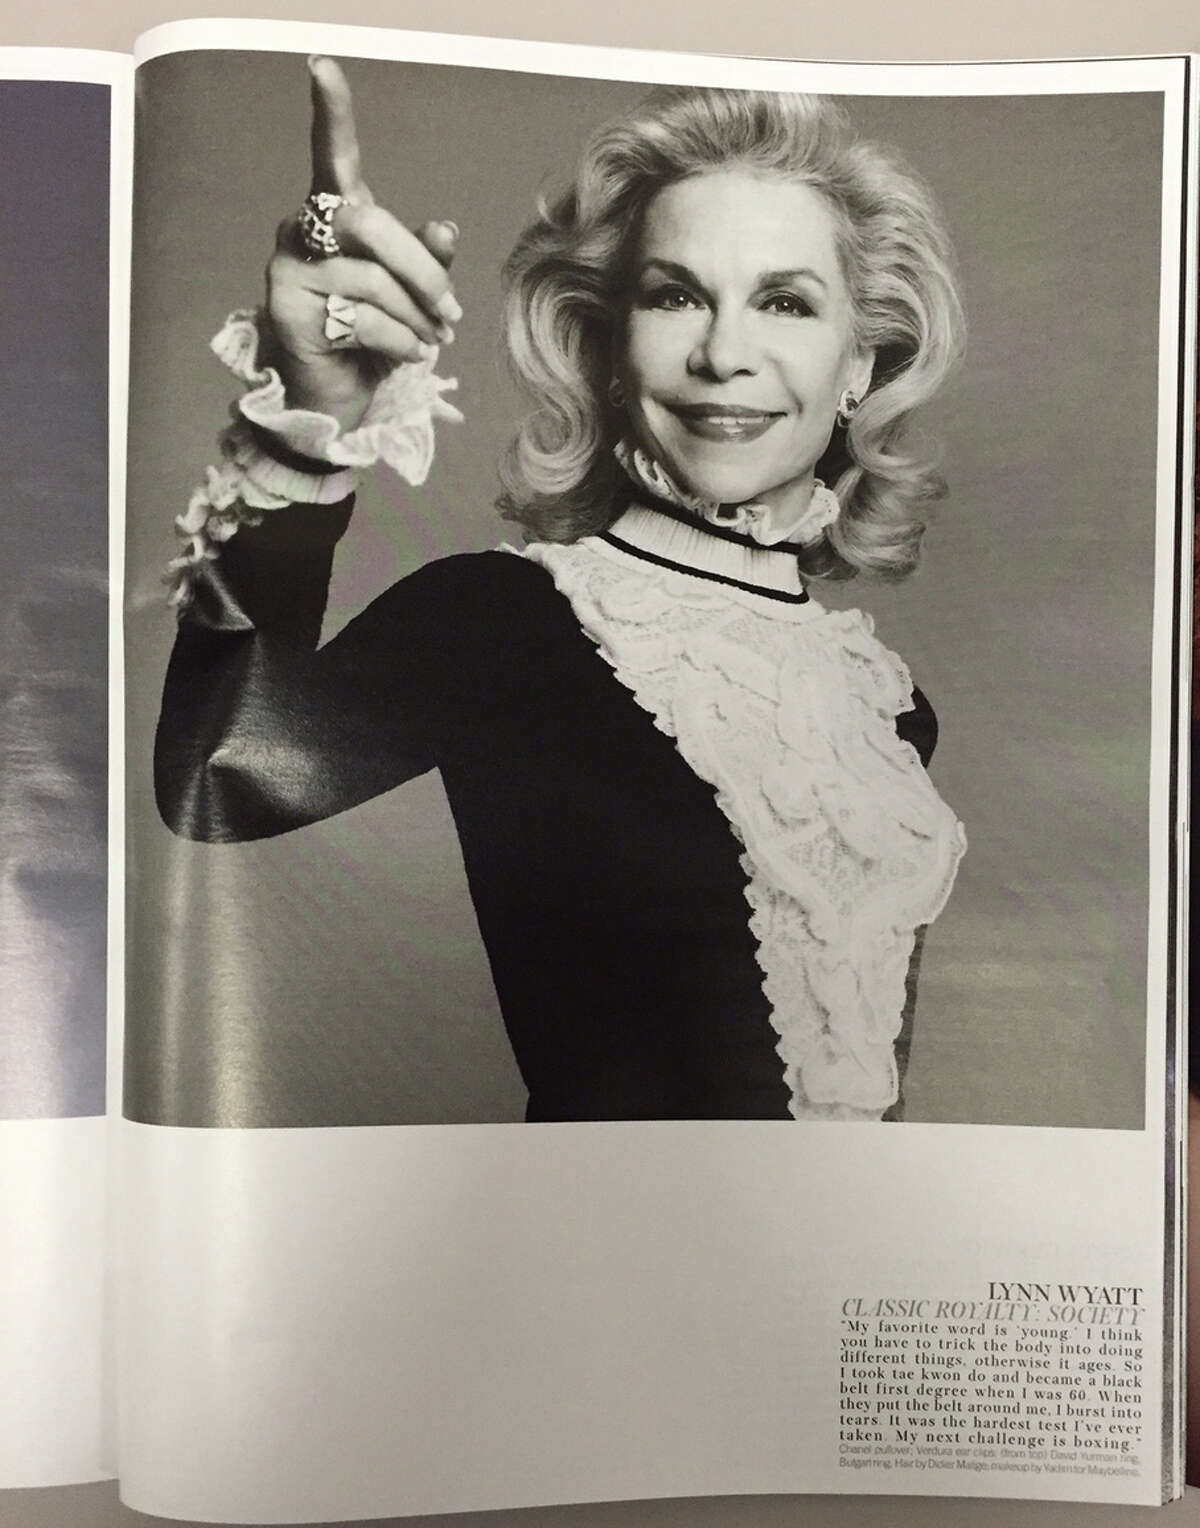 Houston philanthropist Lynn Wyatt in the October 2015 issue of W magazine.